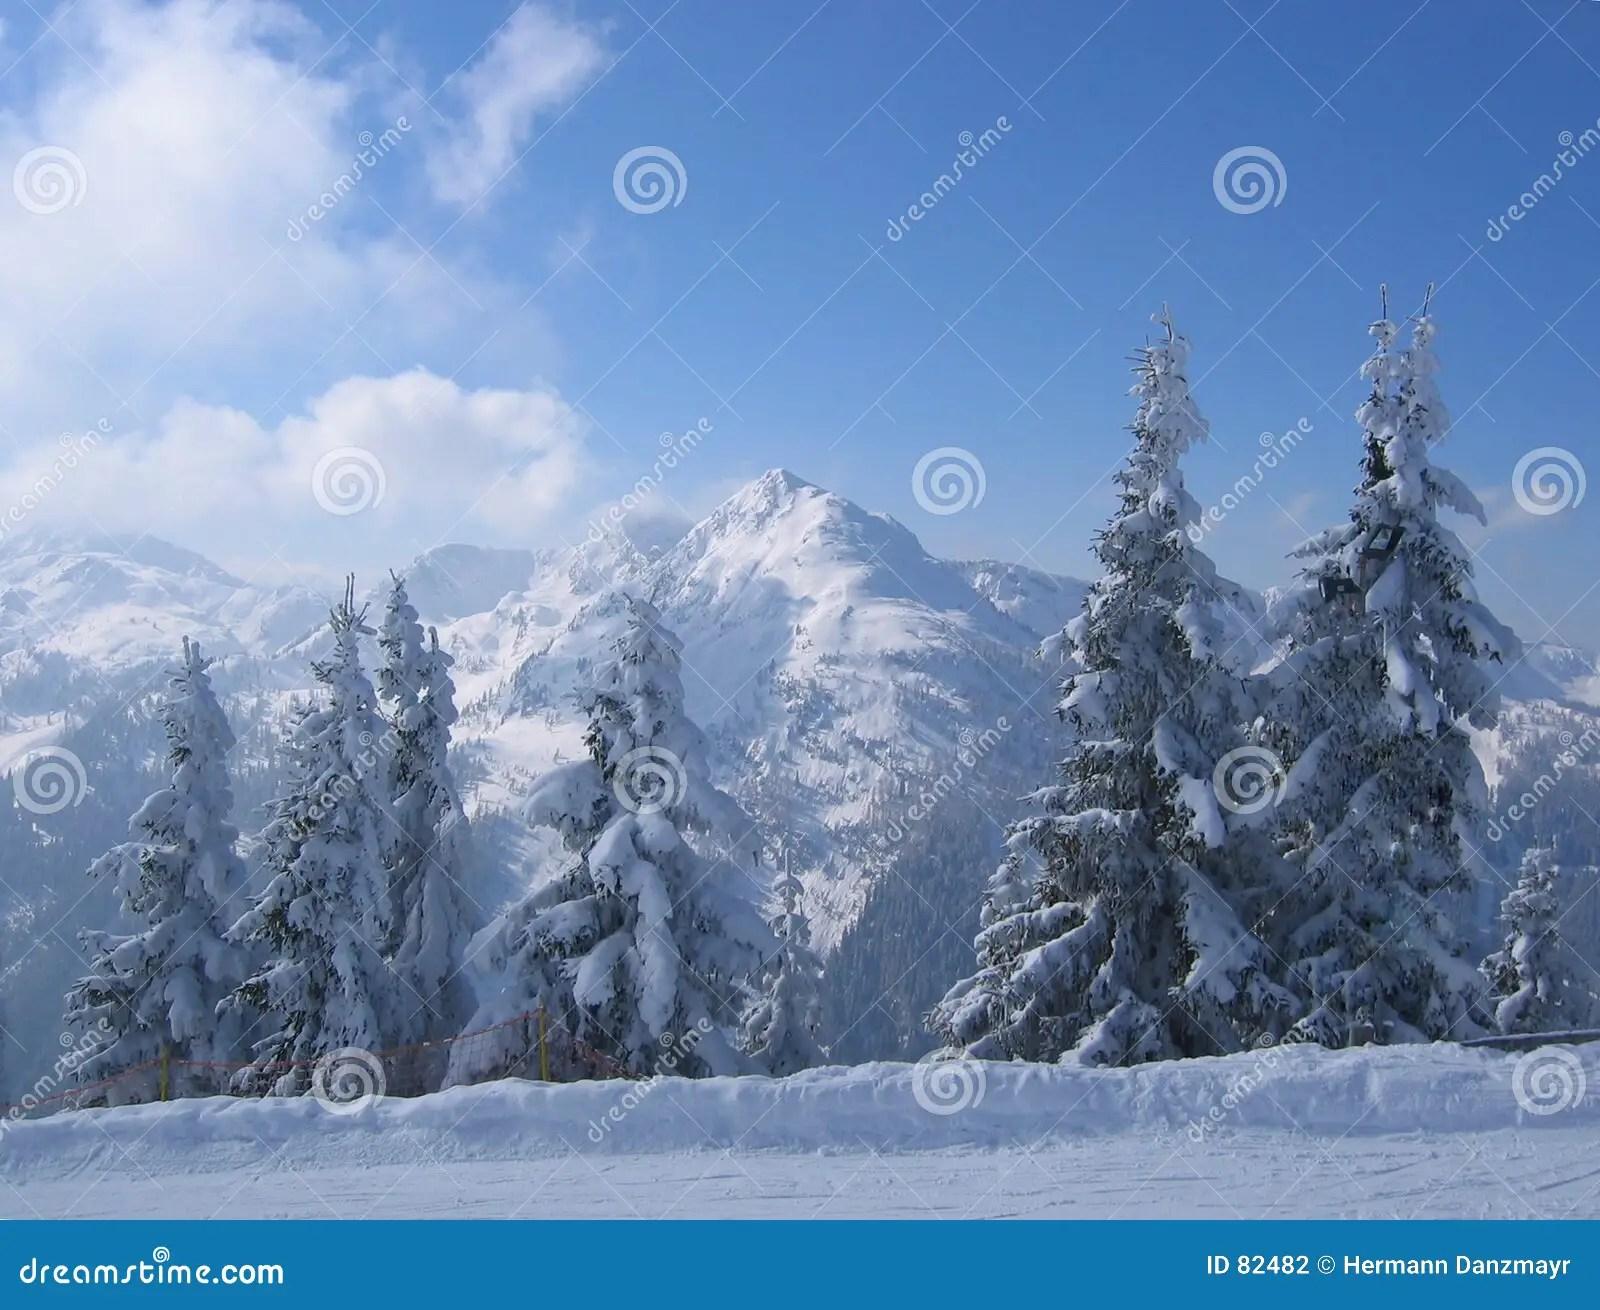 Austria Winter Scene Stock Photography Image 82482